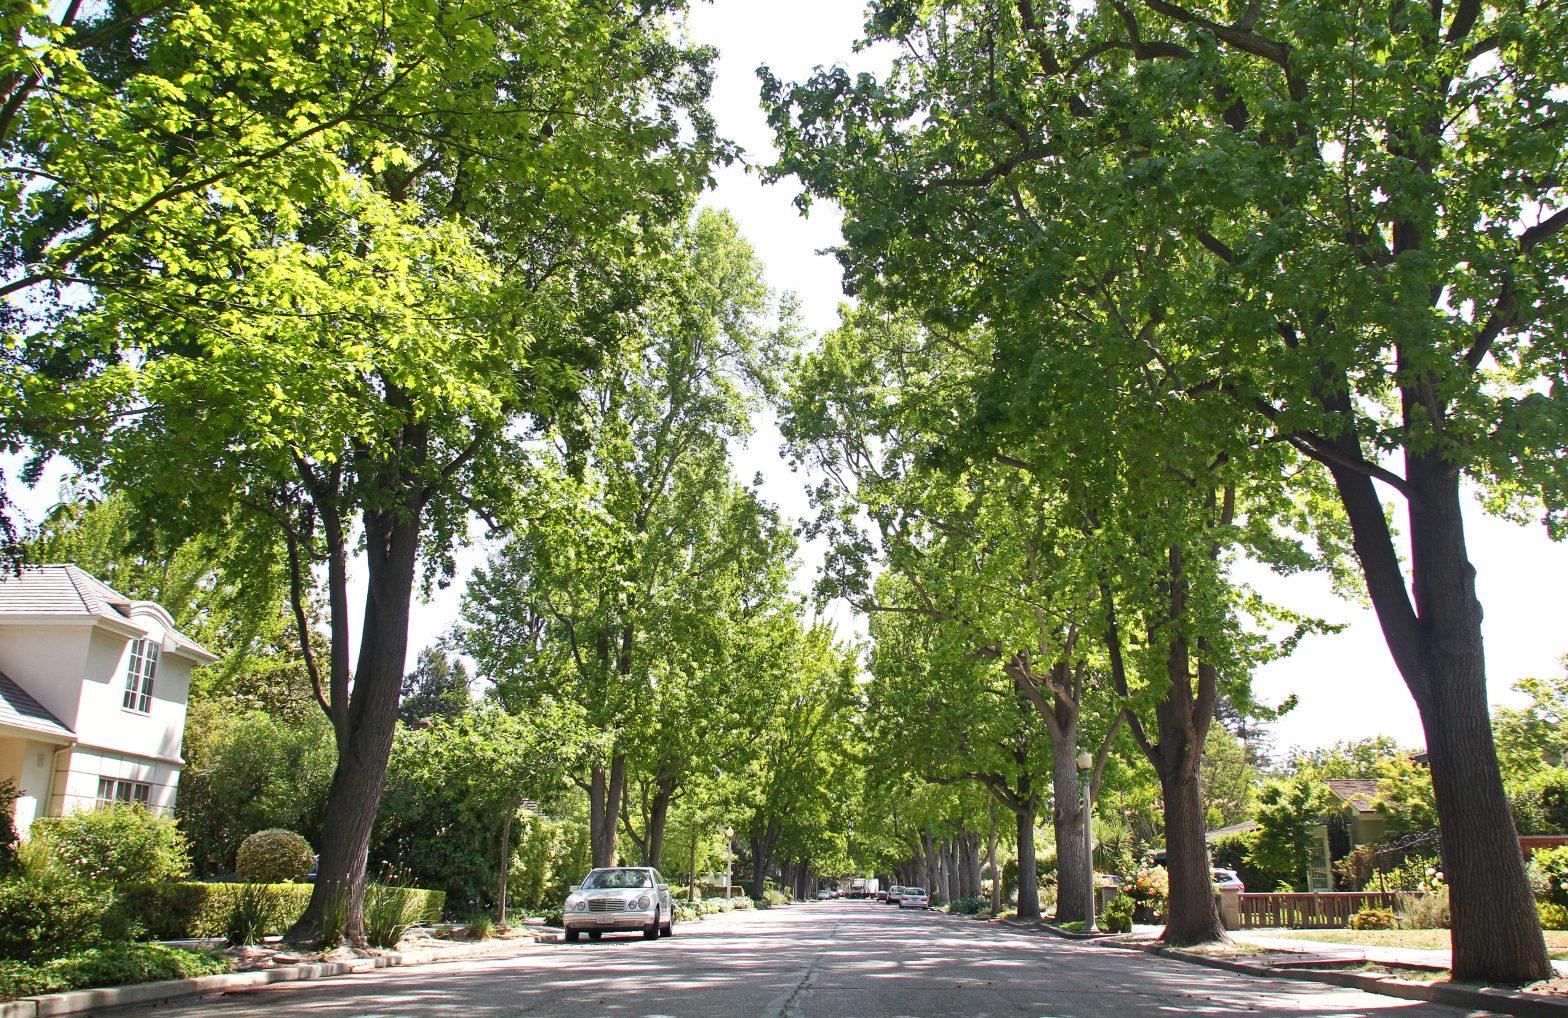 trees-1570742562-70.jpg